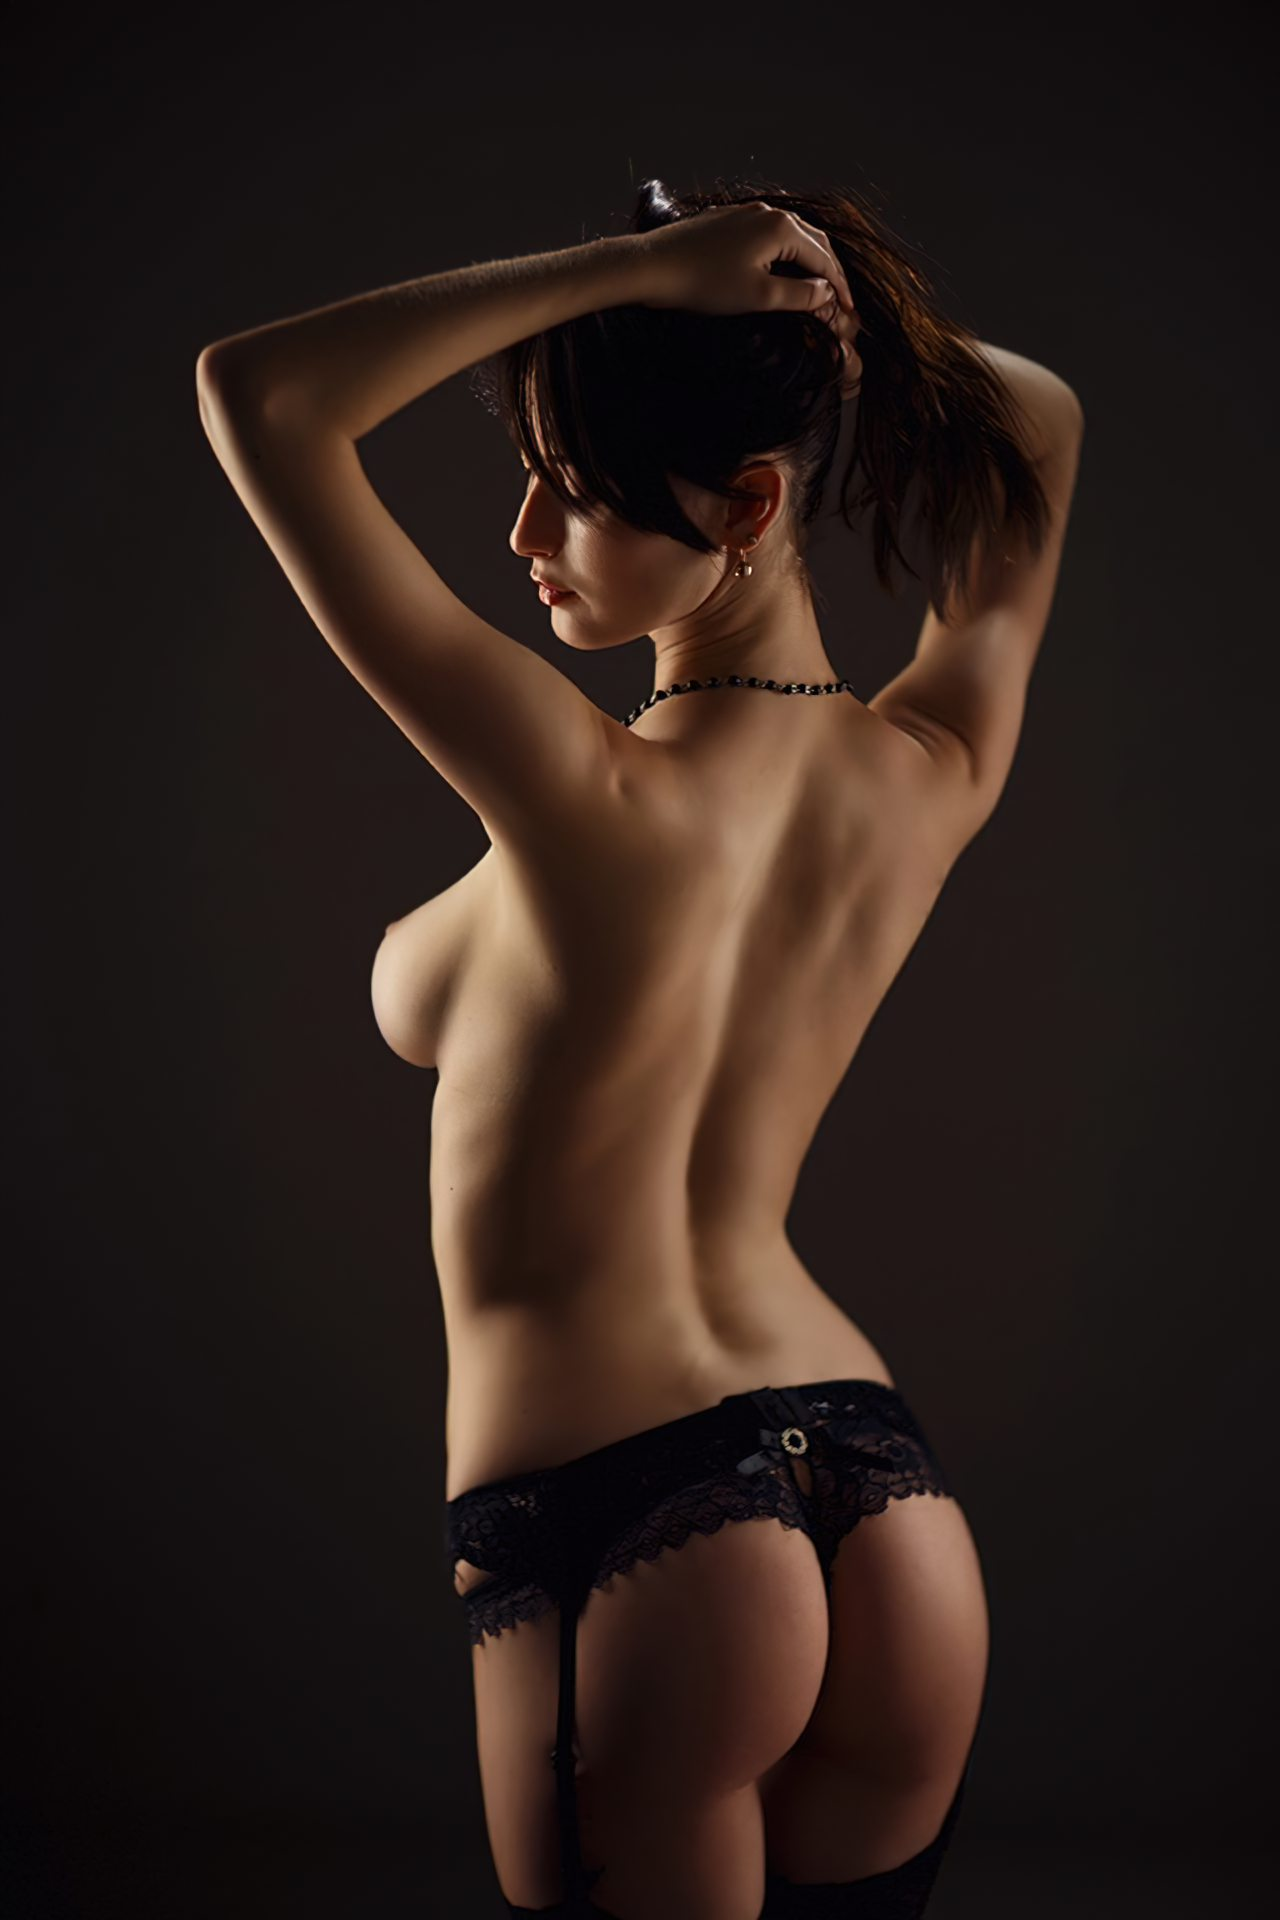 Fotos de Mulheres Nuas (25)